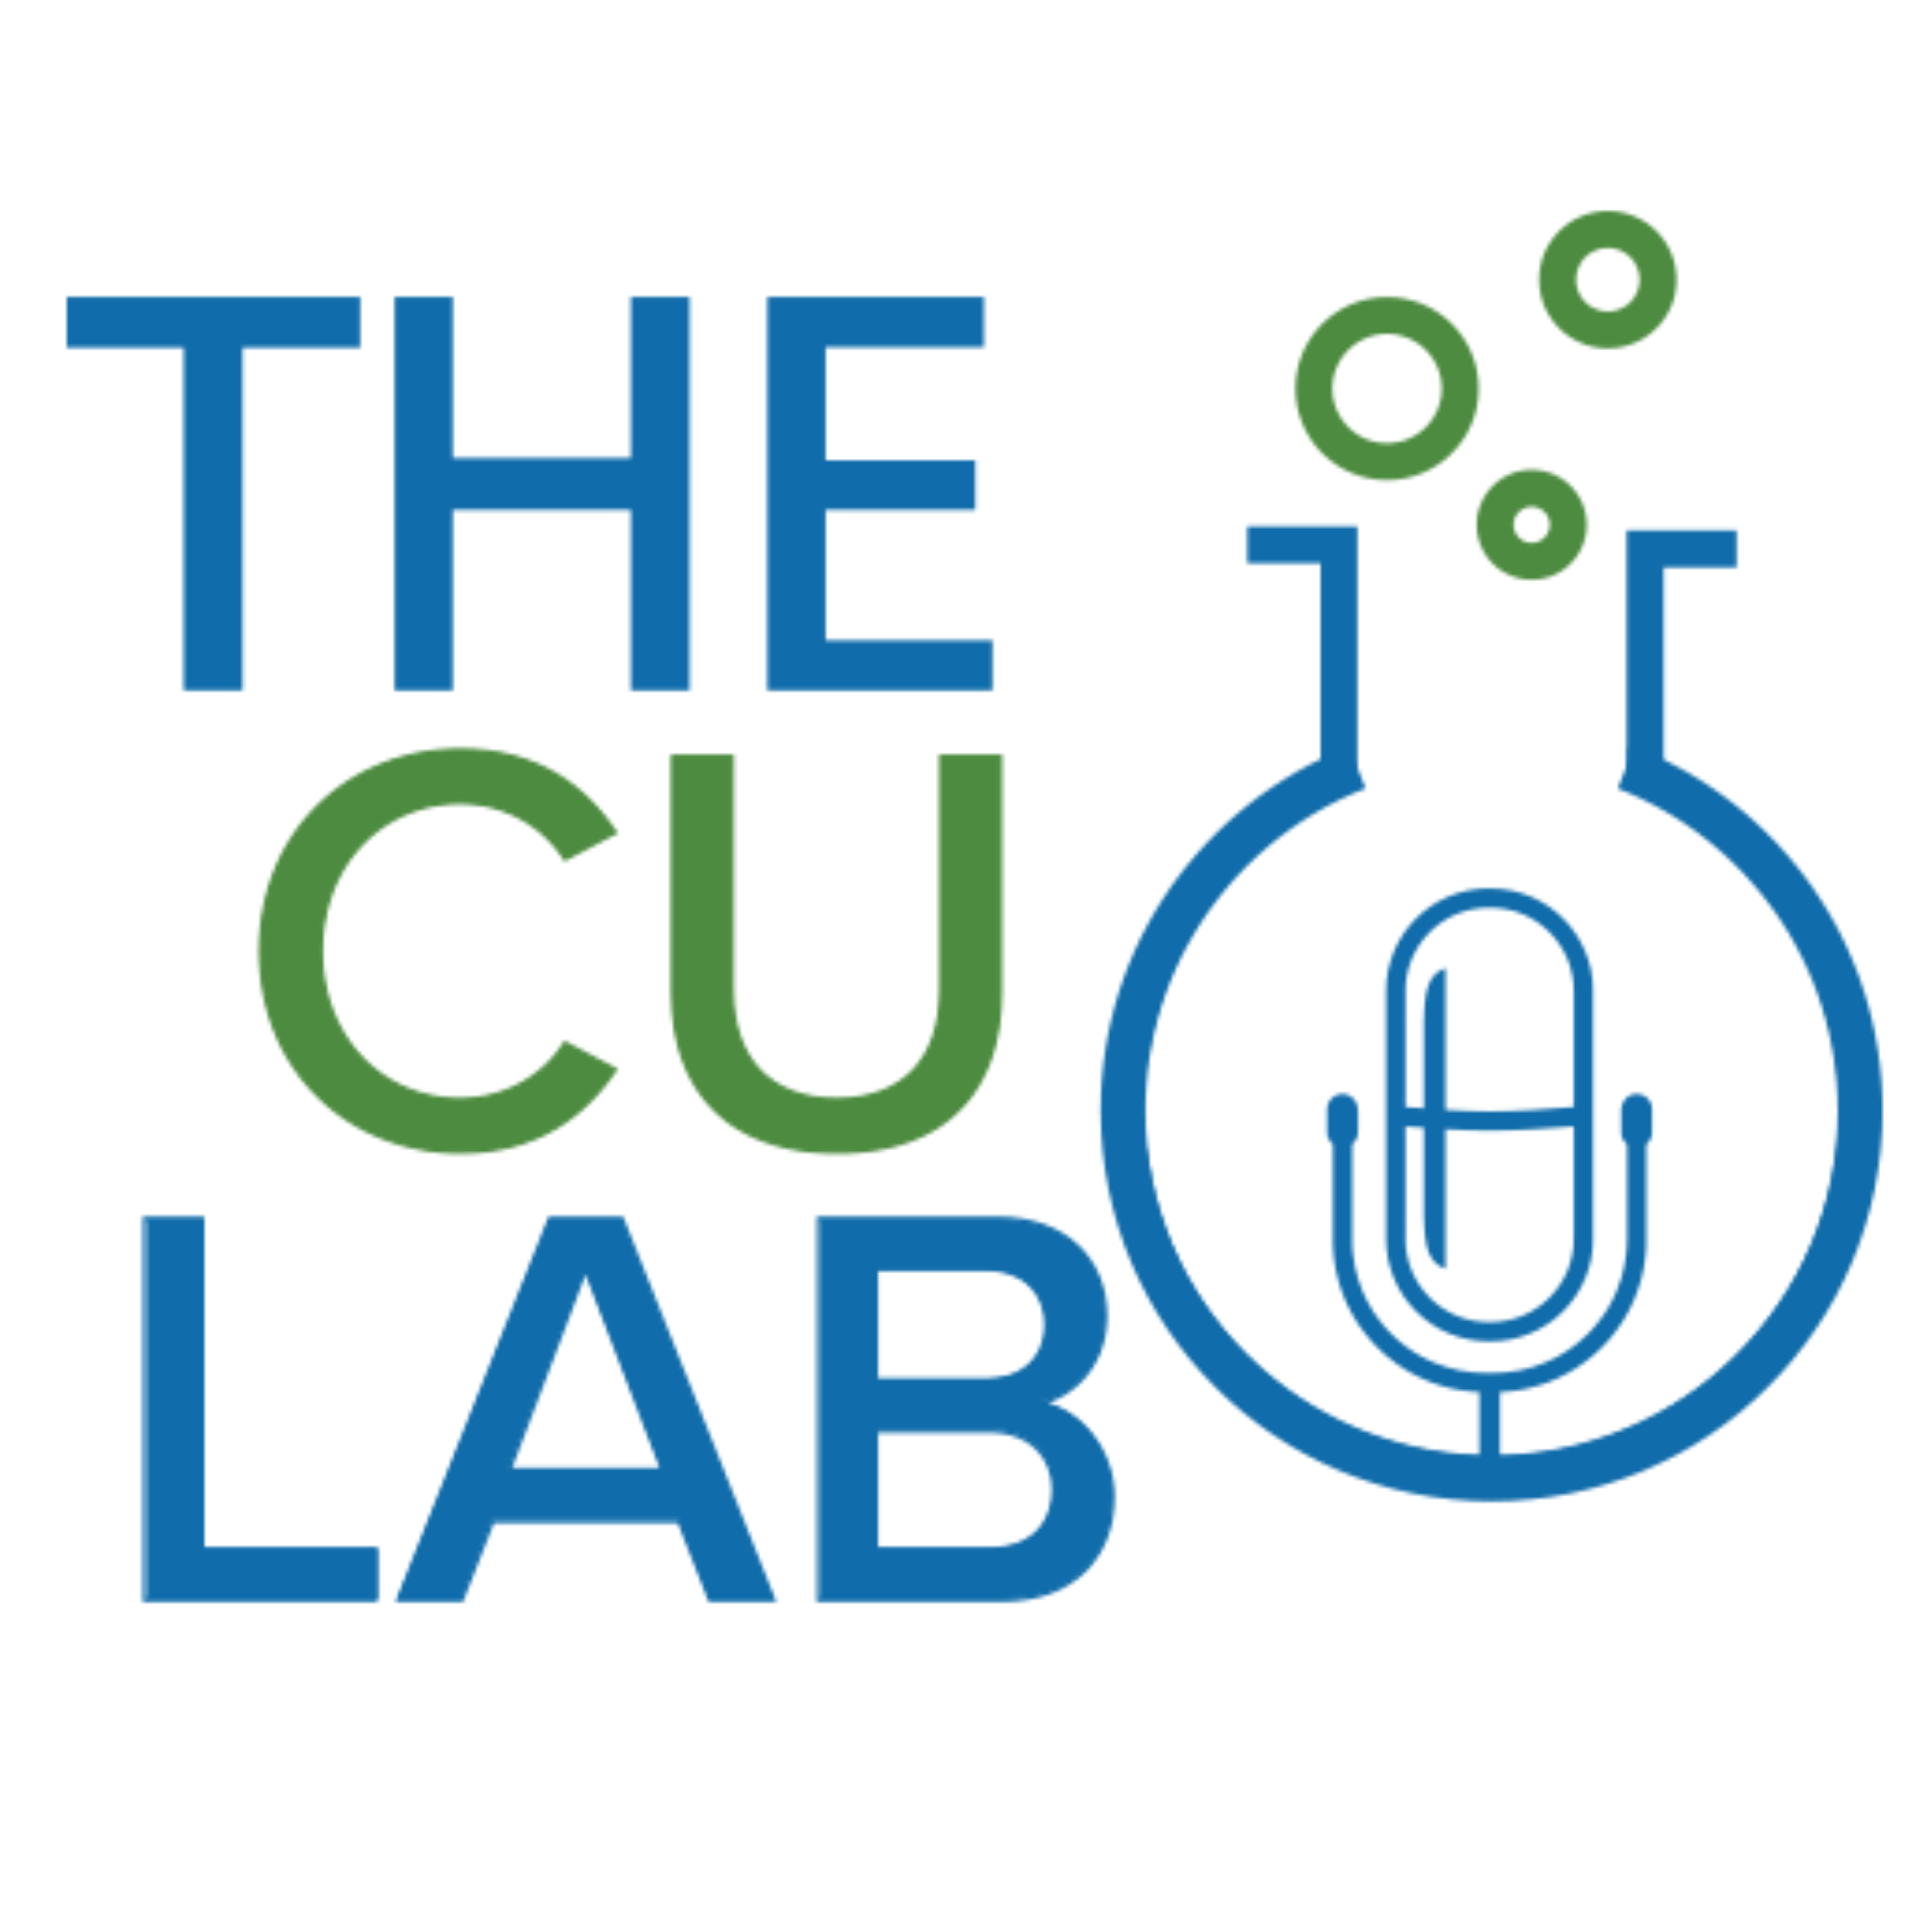 The CU Lab with NAFCU Services show art